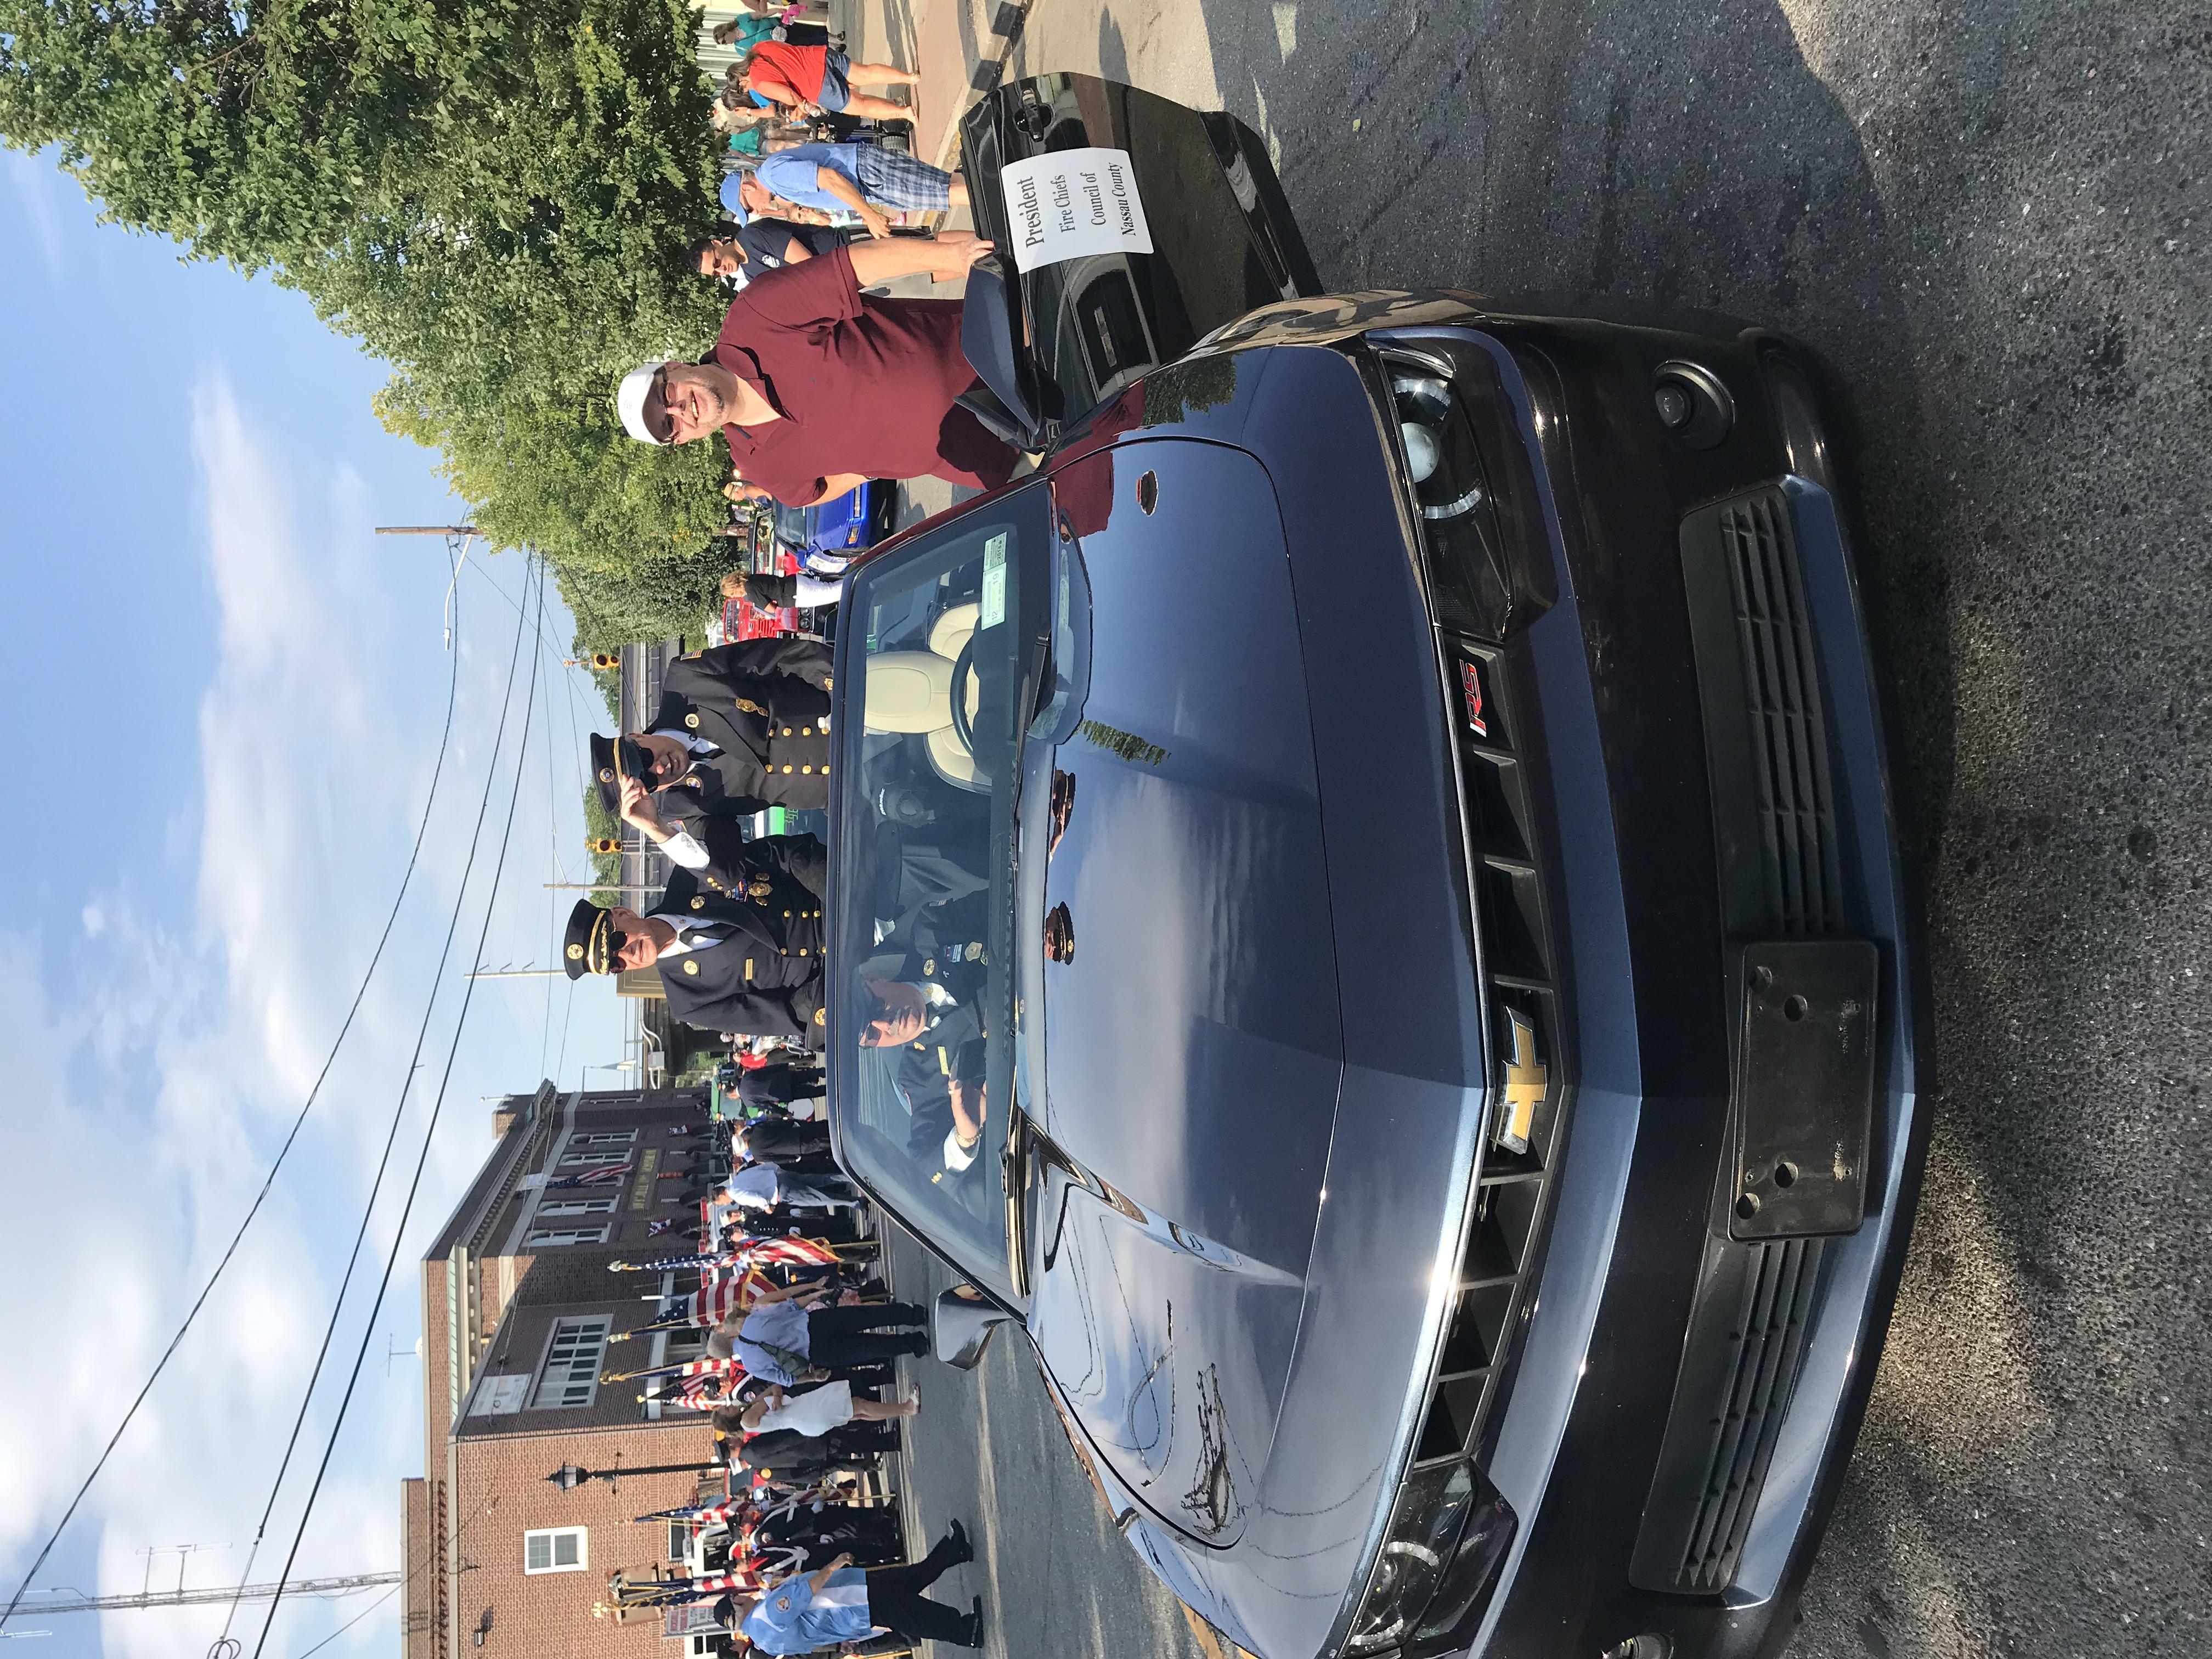 Hicksville Parade